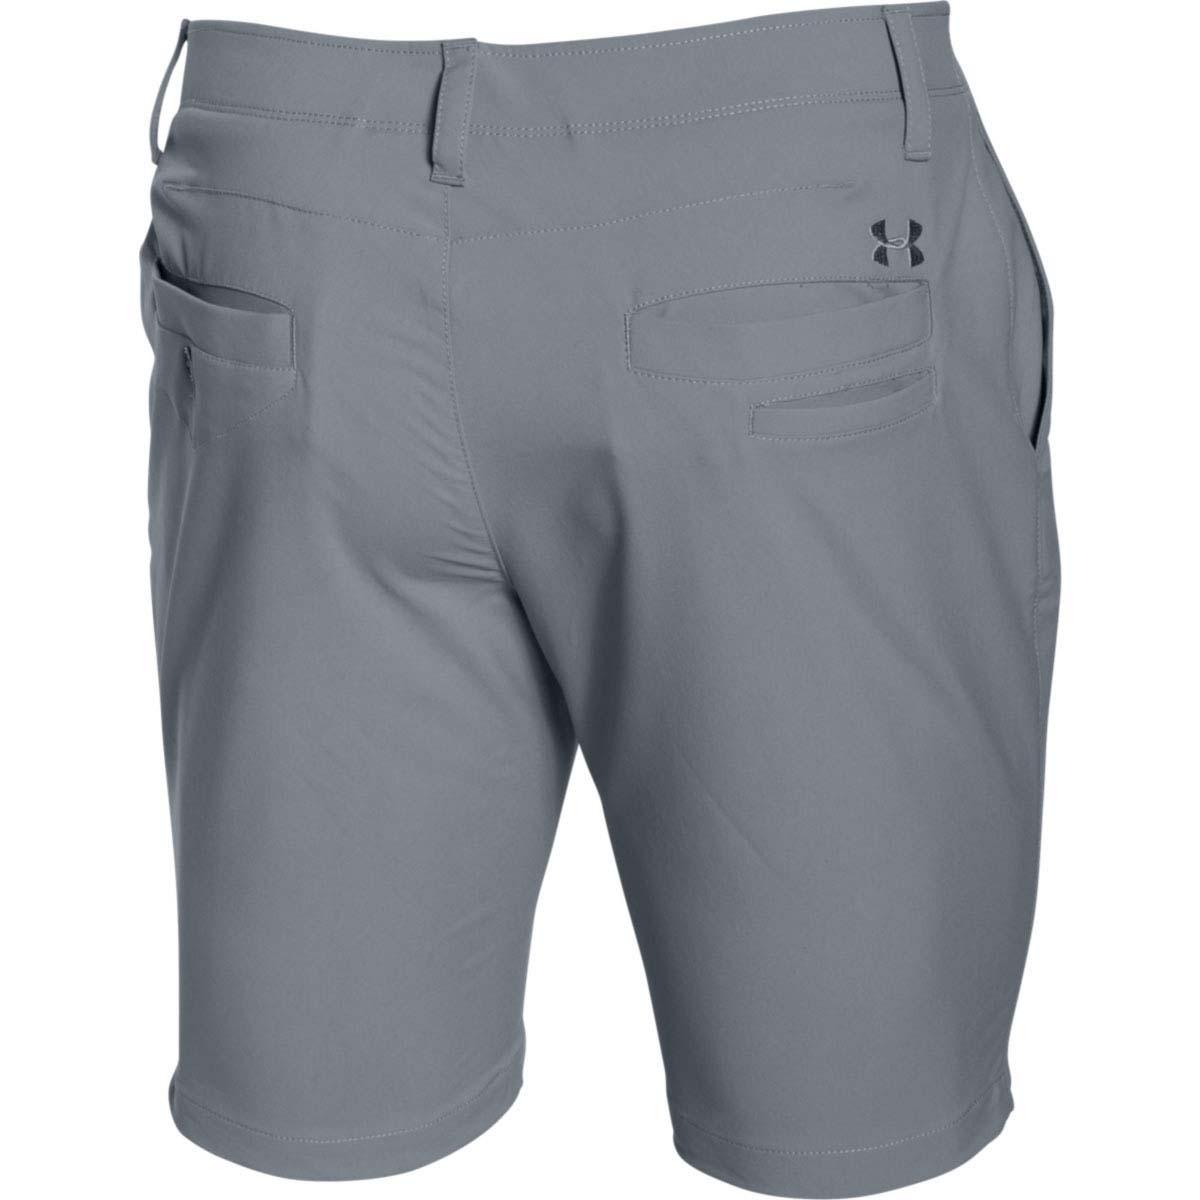 Under-Armour-Mens-UA-Match-Play-Taper-Tech-Performance-Summer-Golf-Shorts thumbnail 21